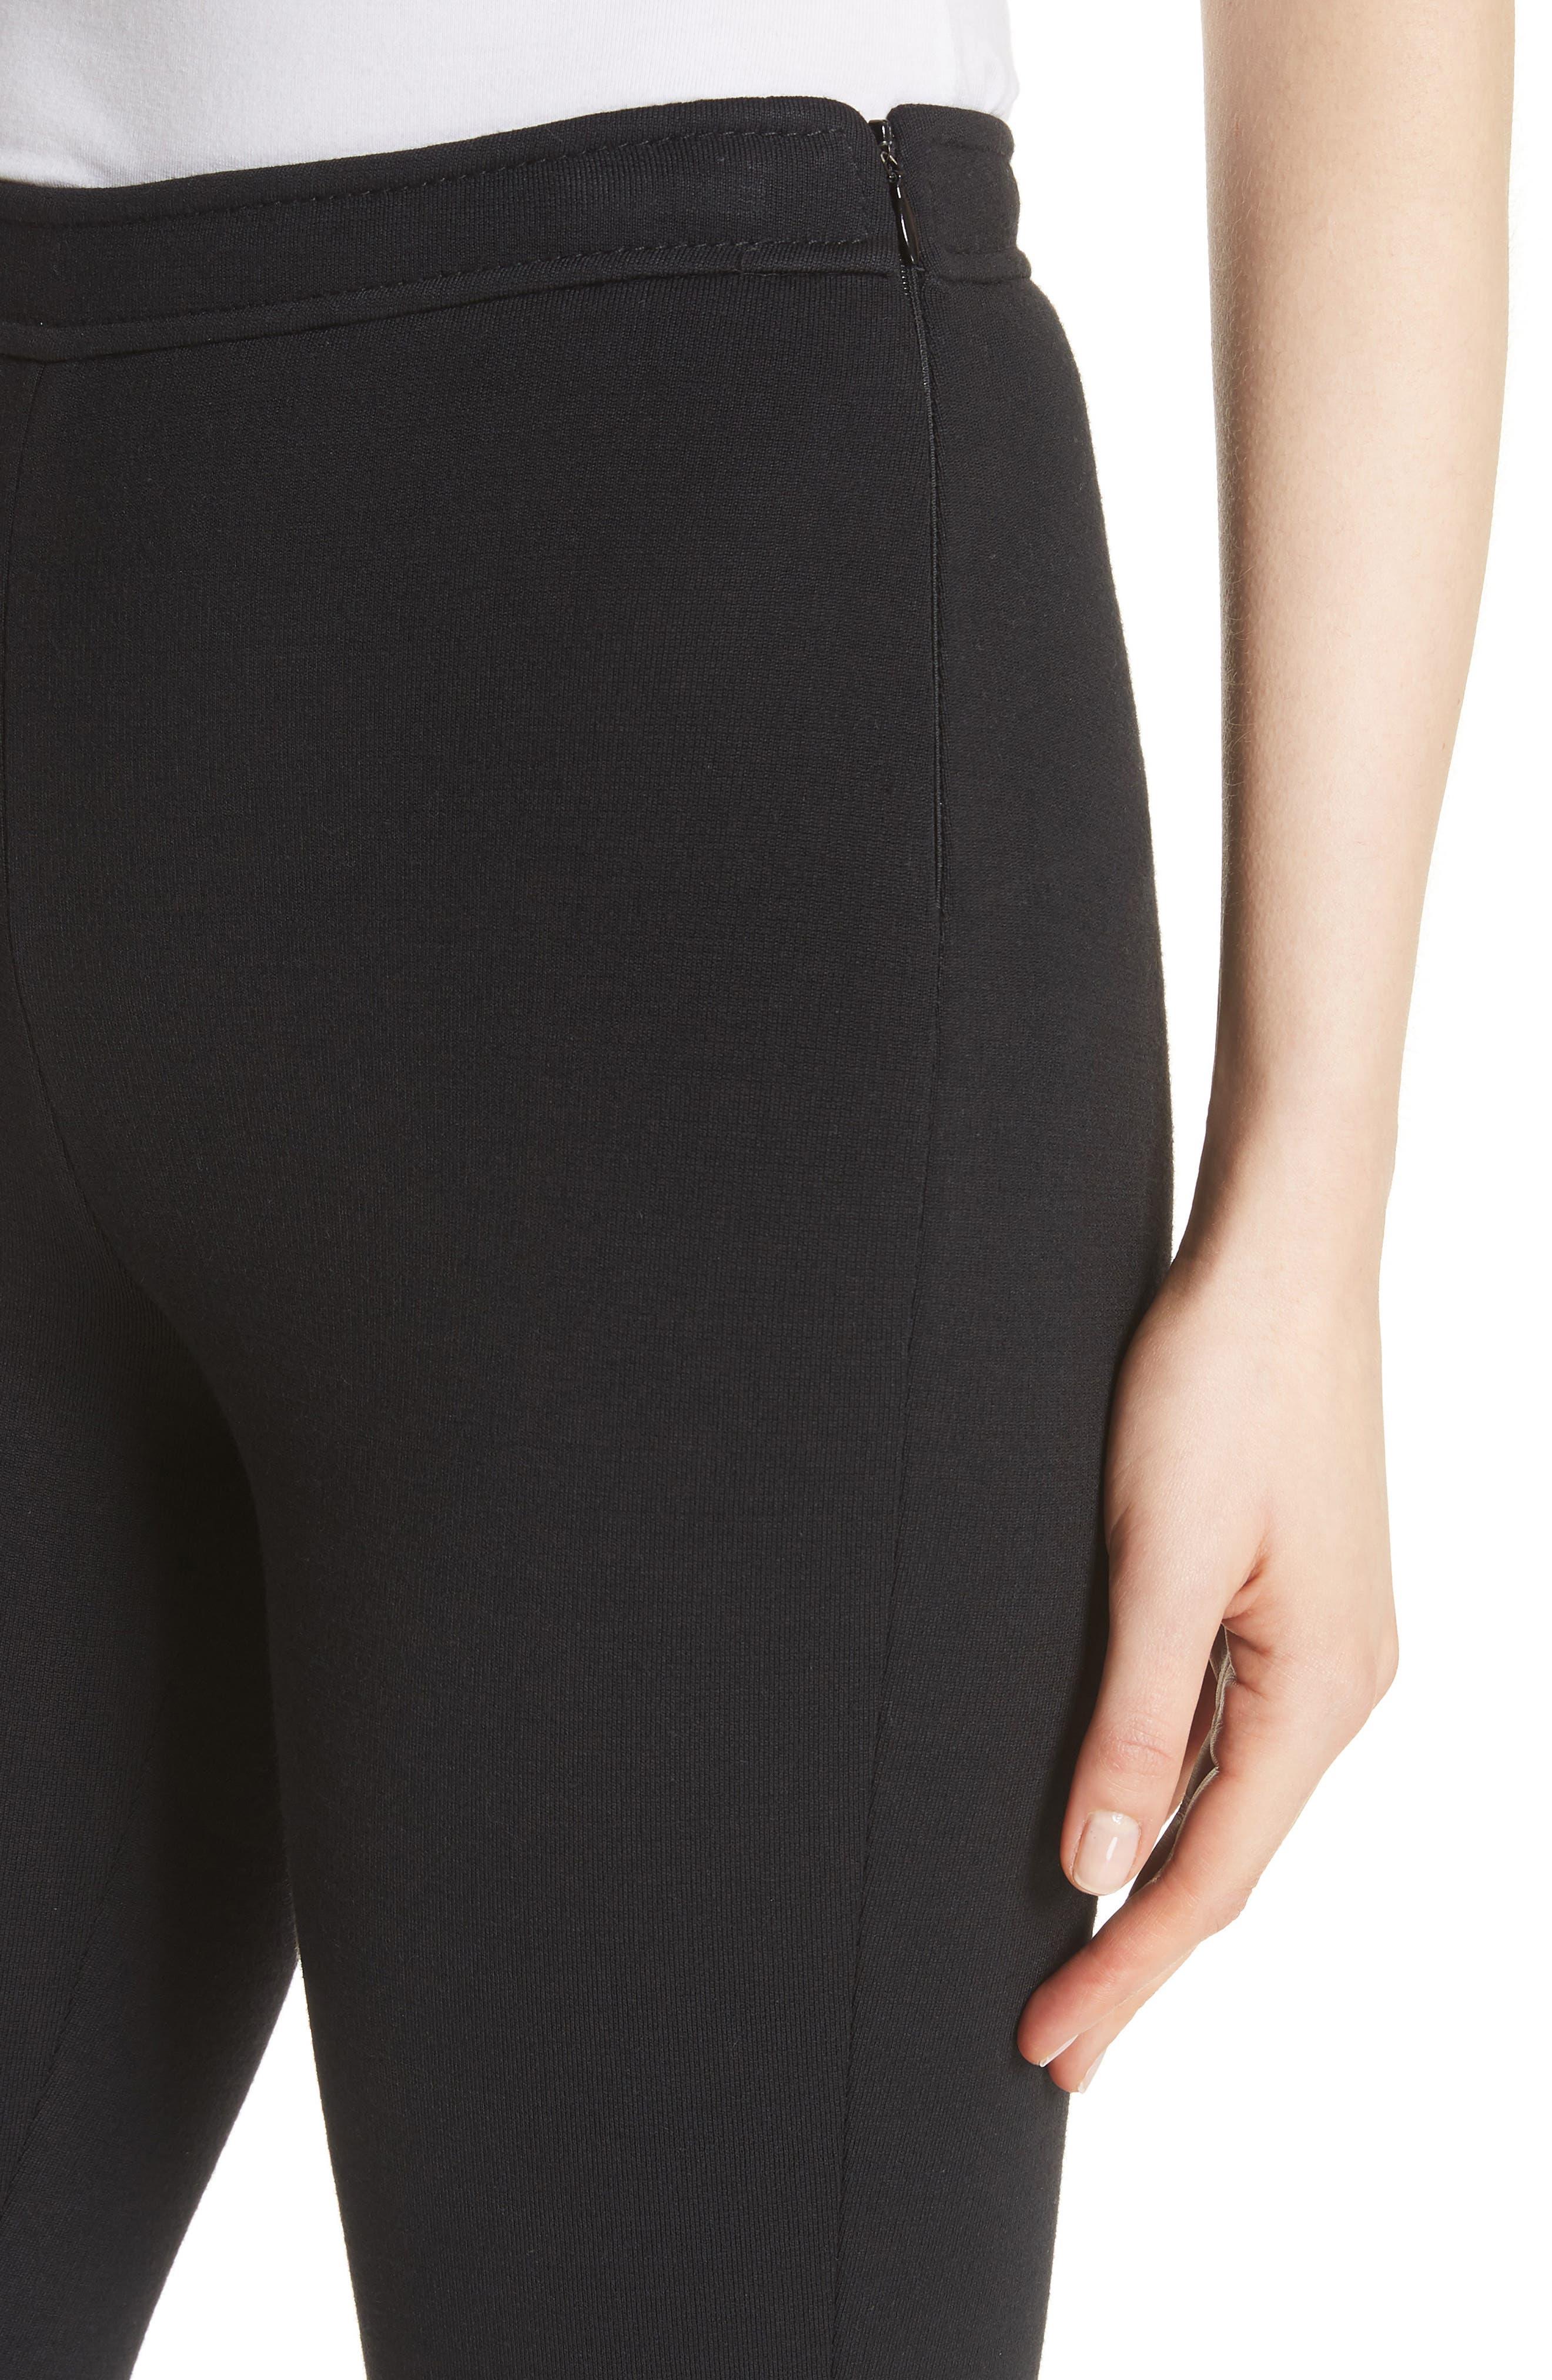 Alexa Milano Knit Pants,                             Alternate thumbnail 4, color,                             Caviar